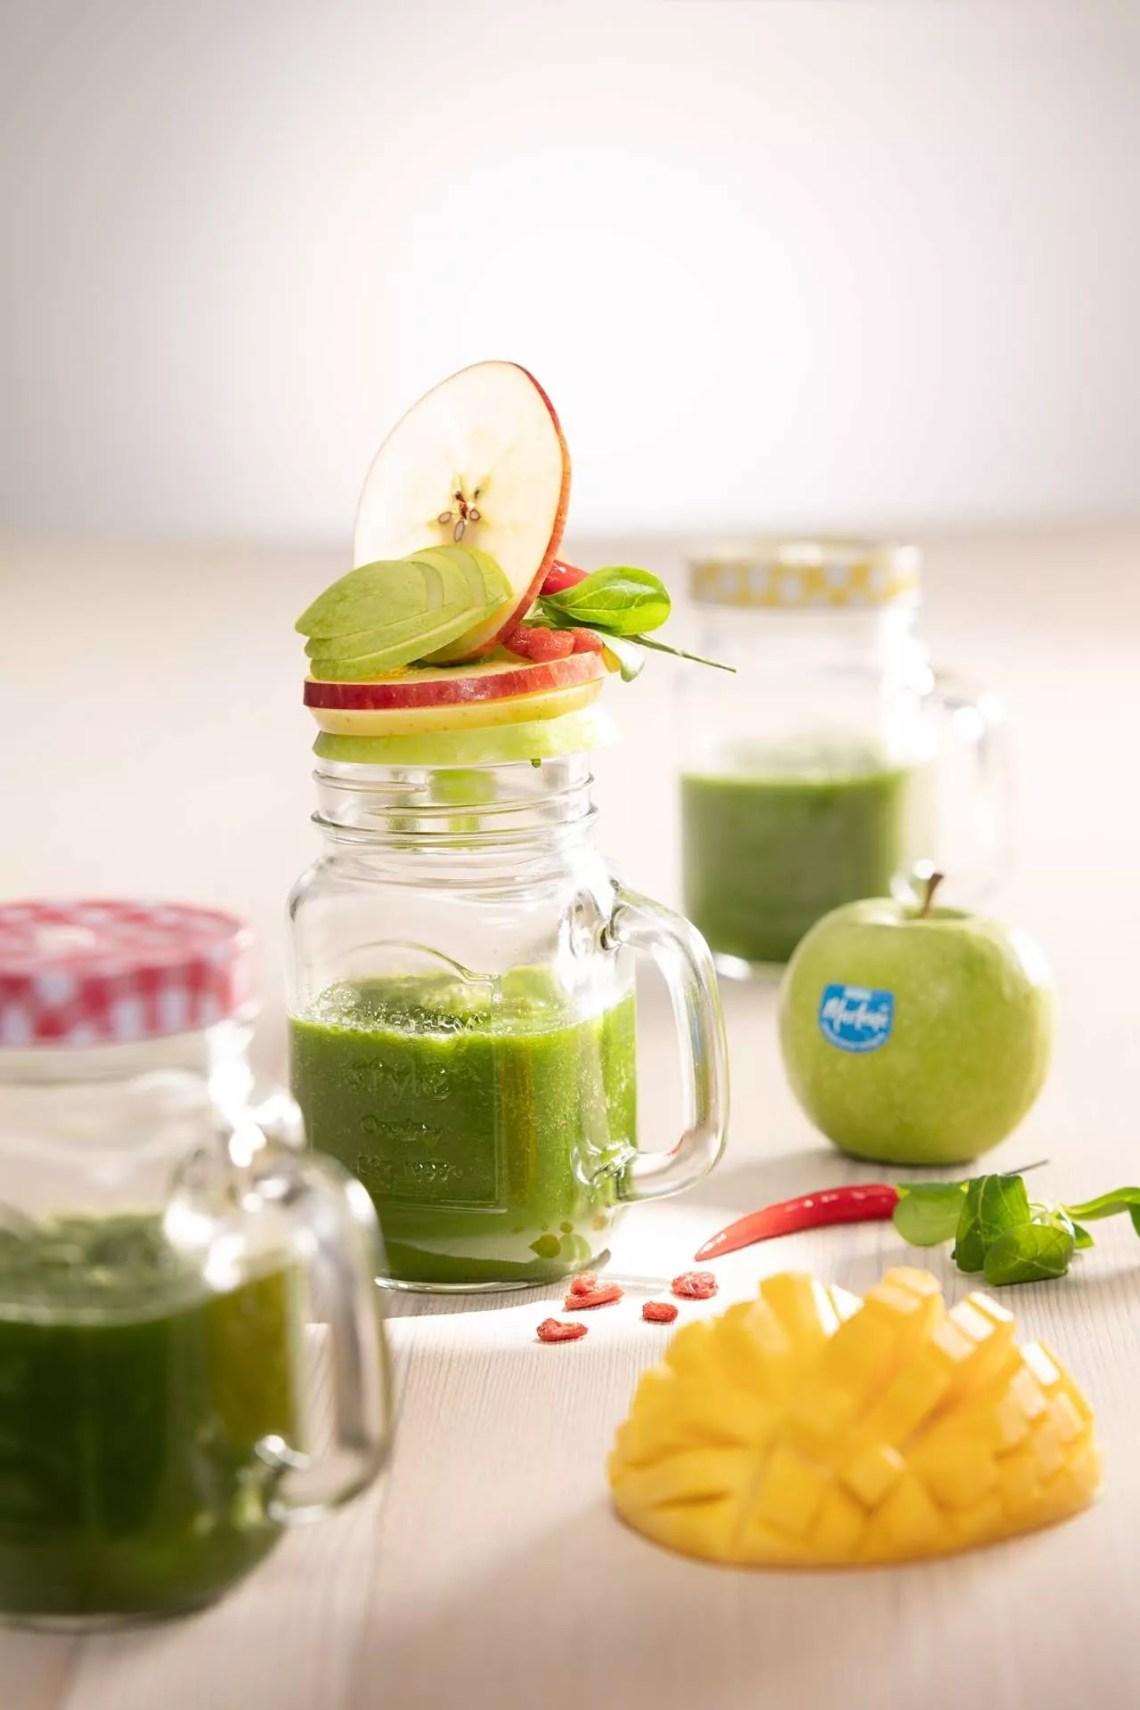 gezonde smoothie met mango en marlene appels